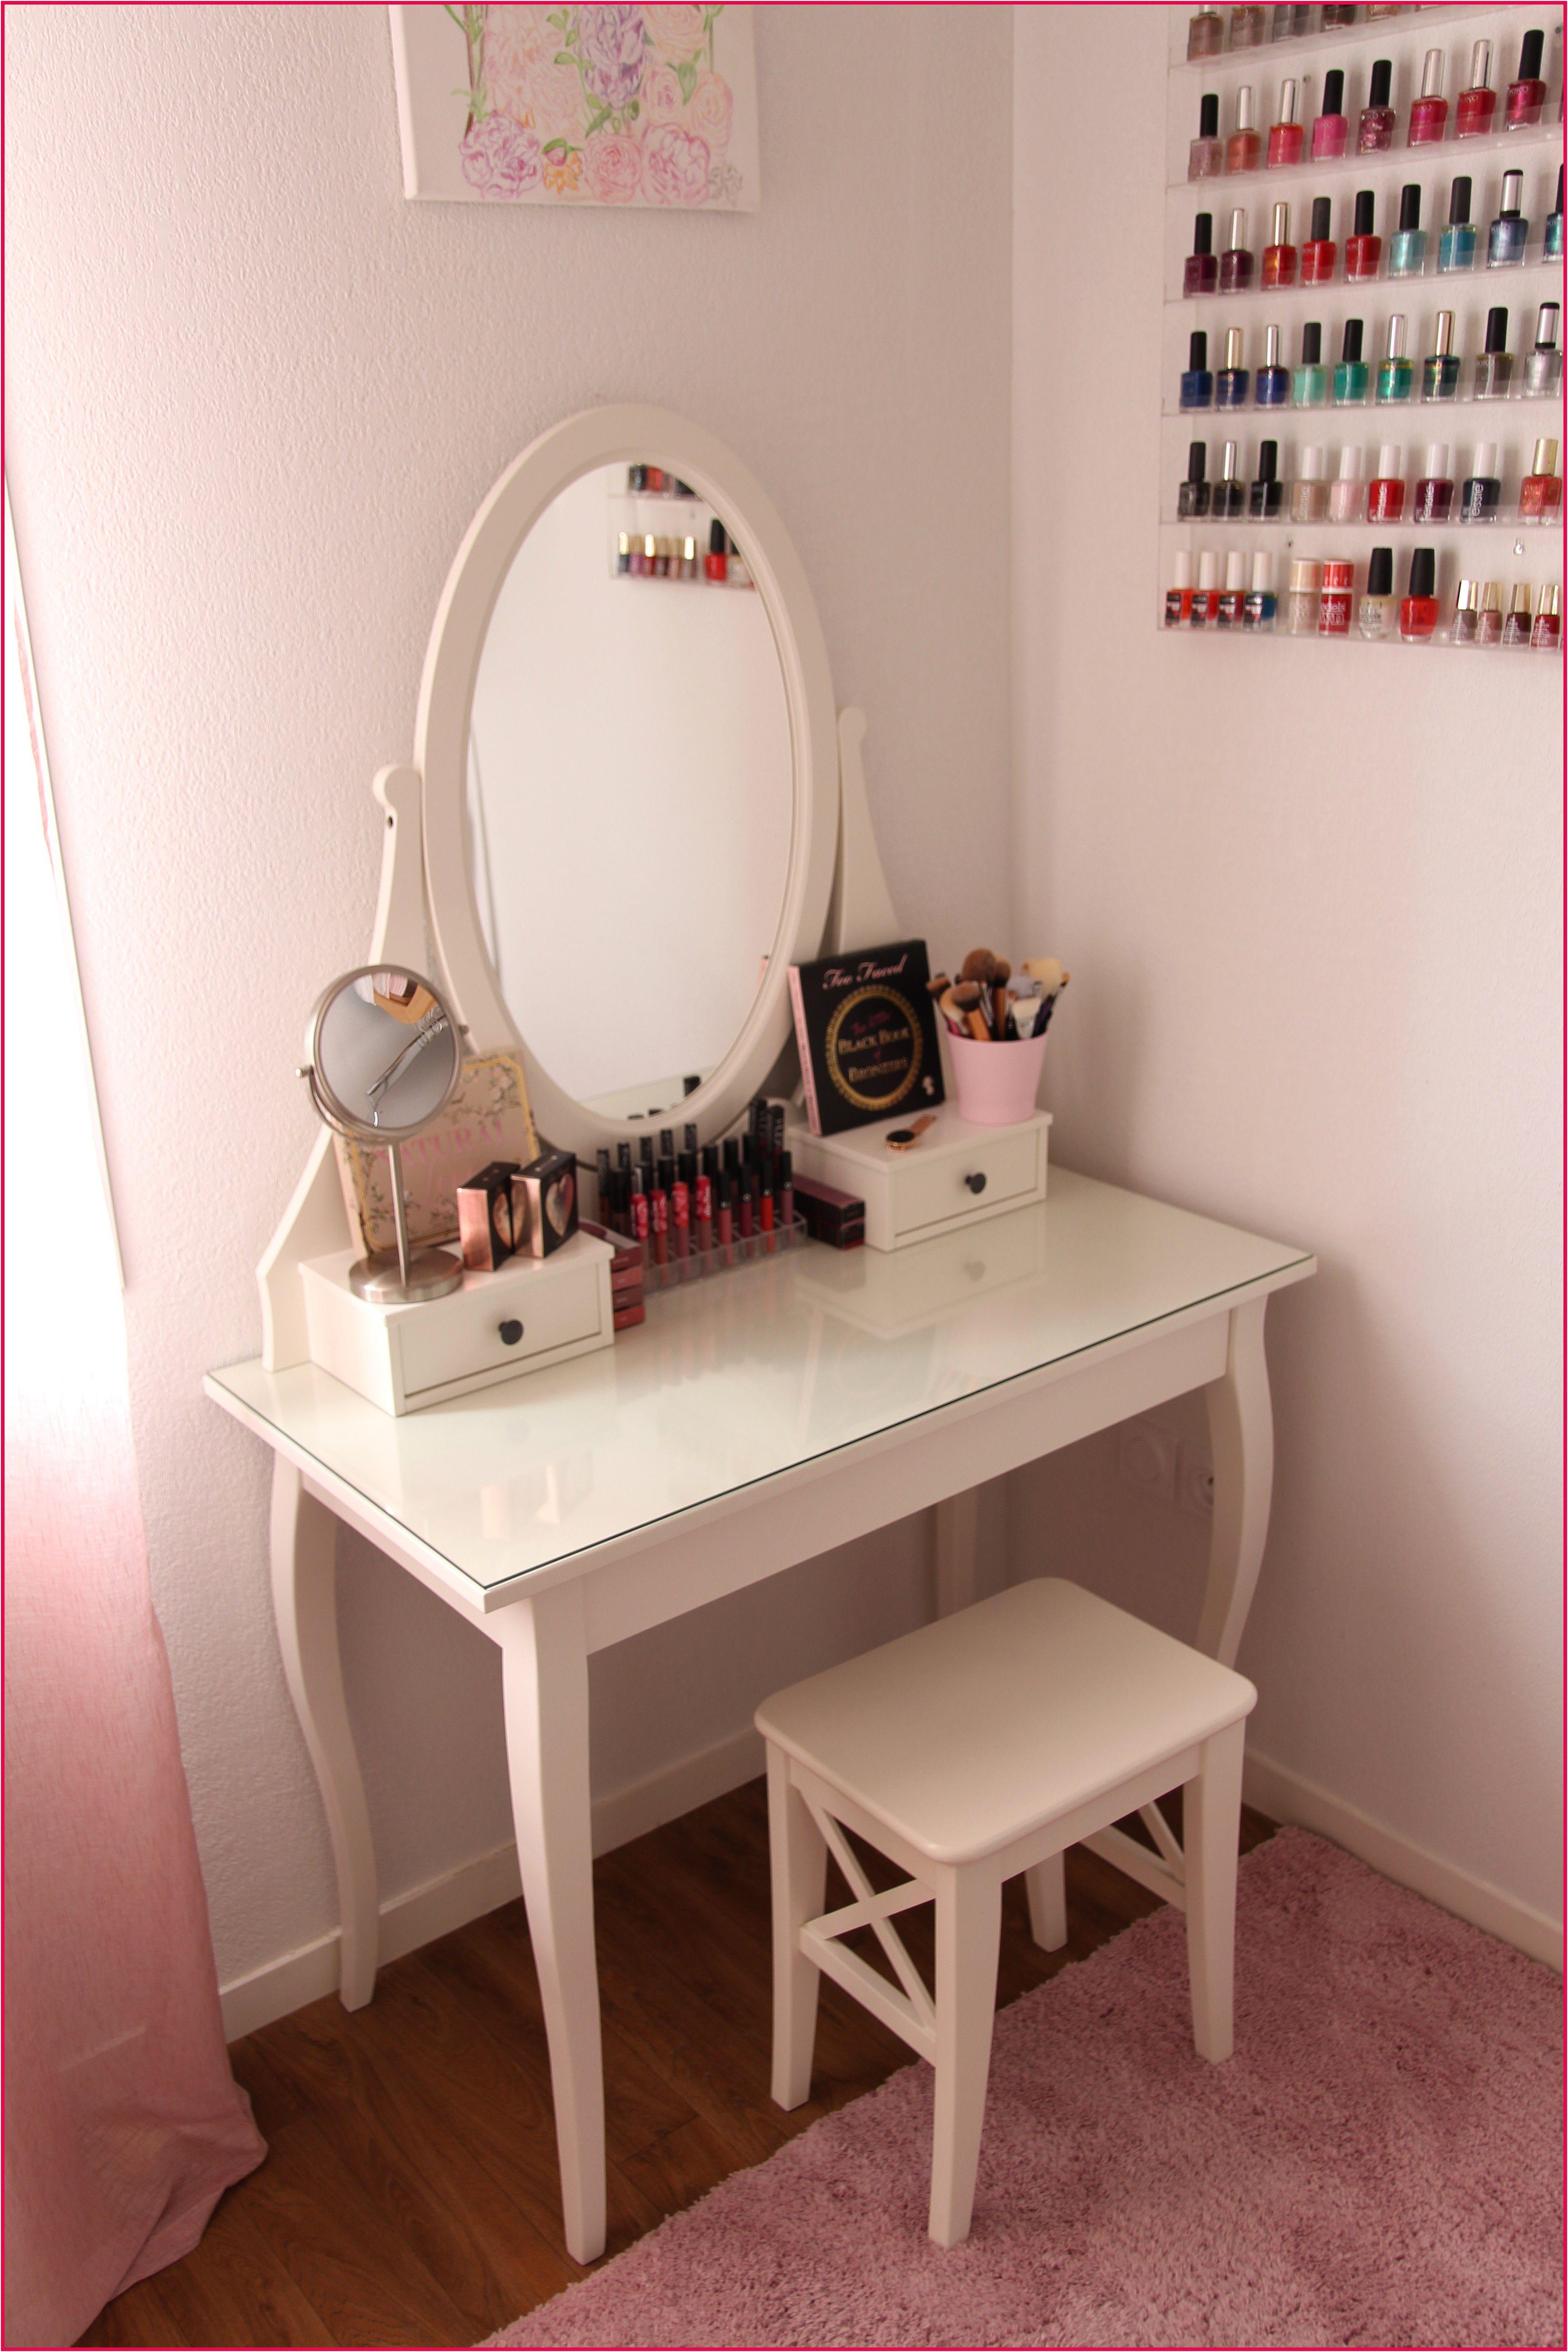 13 Paisible Bureau Coiffeuse Ikea Photograph Coiffeuse Ikea Coiffeuse En Bois Idees De Coiffeuse